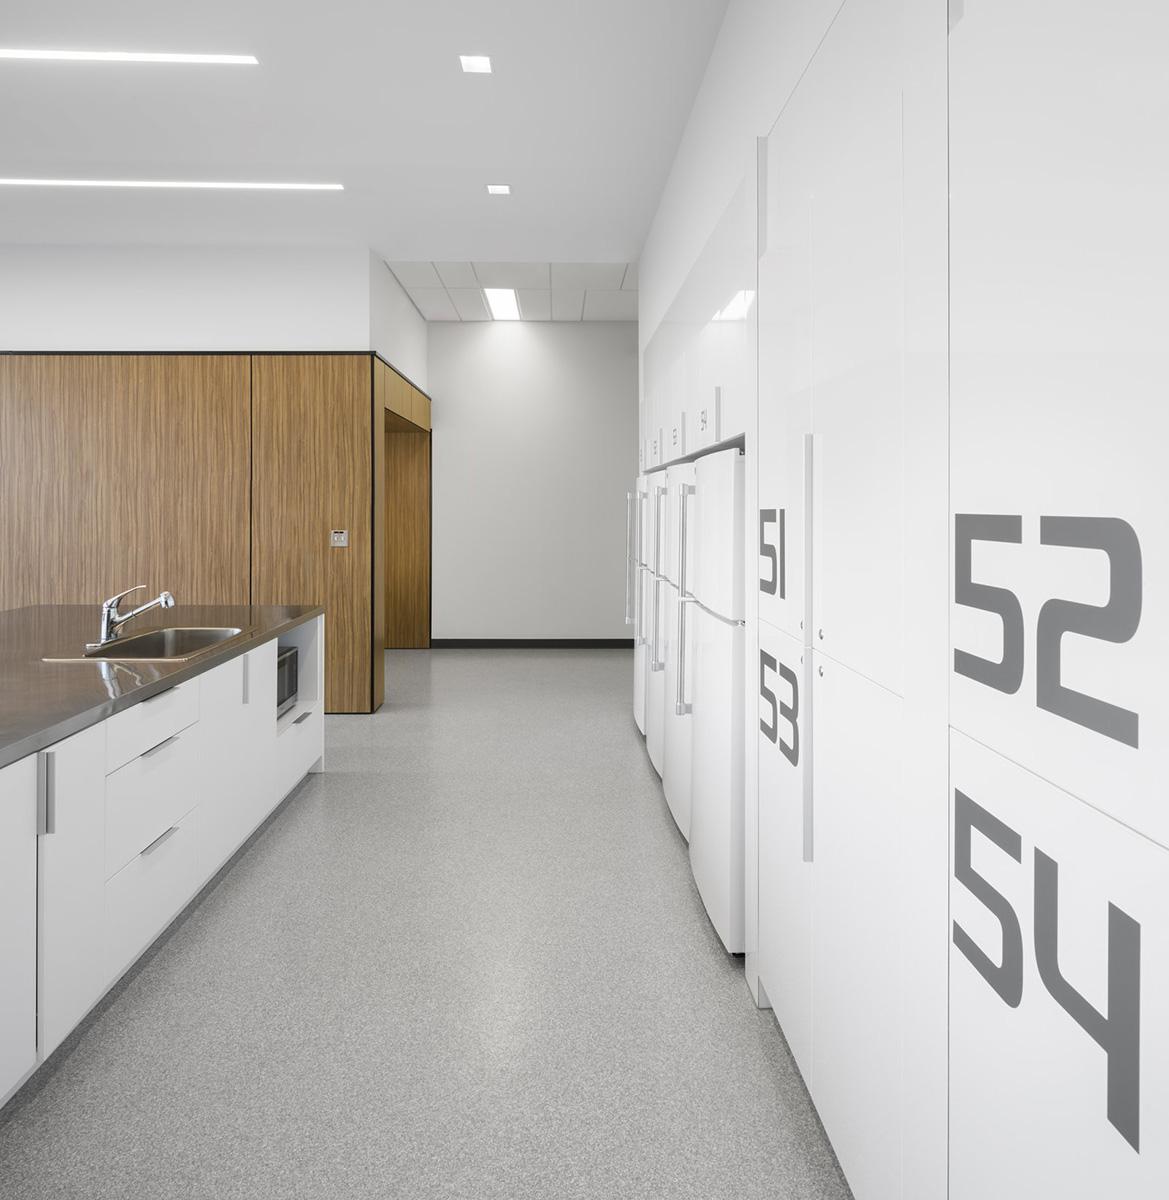 16-caserne-no5-stgm-architects-ccm2-architects-foto-stephane-groleau